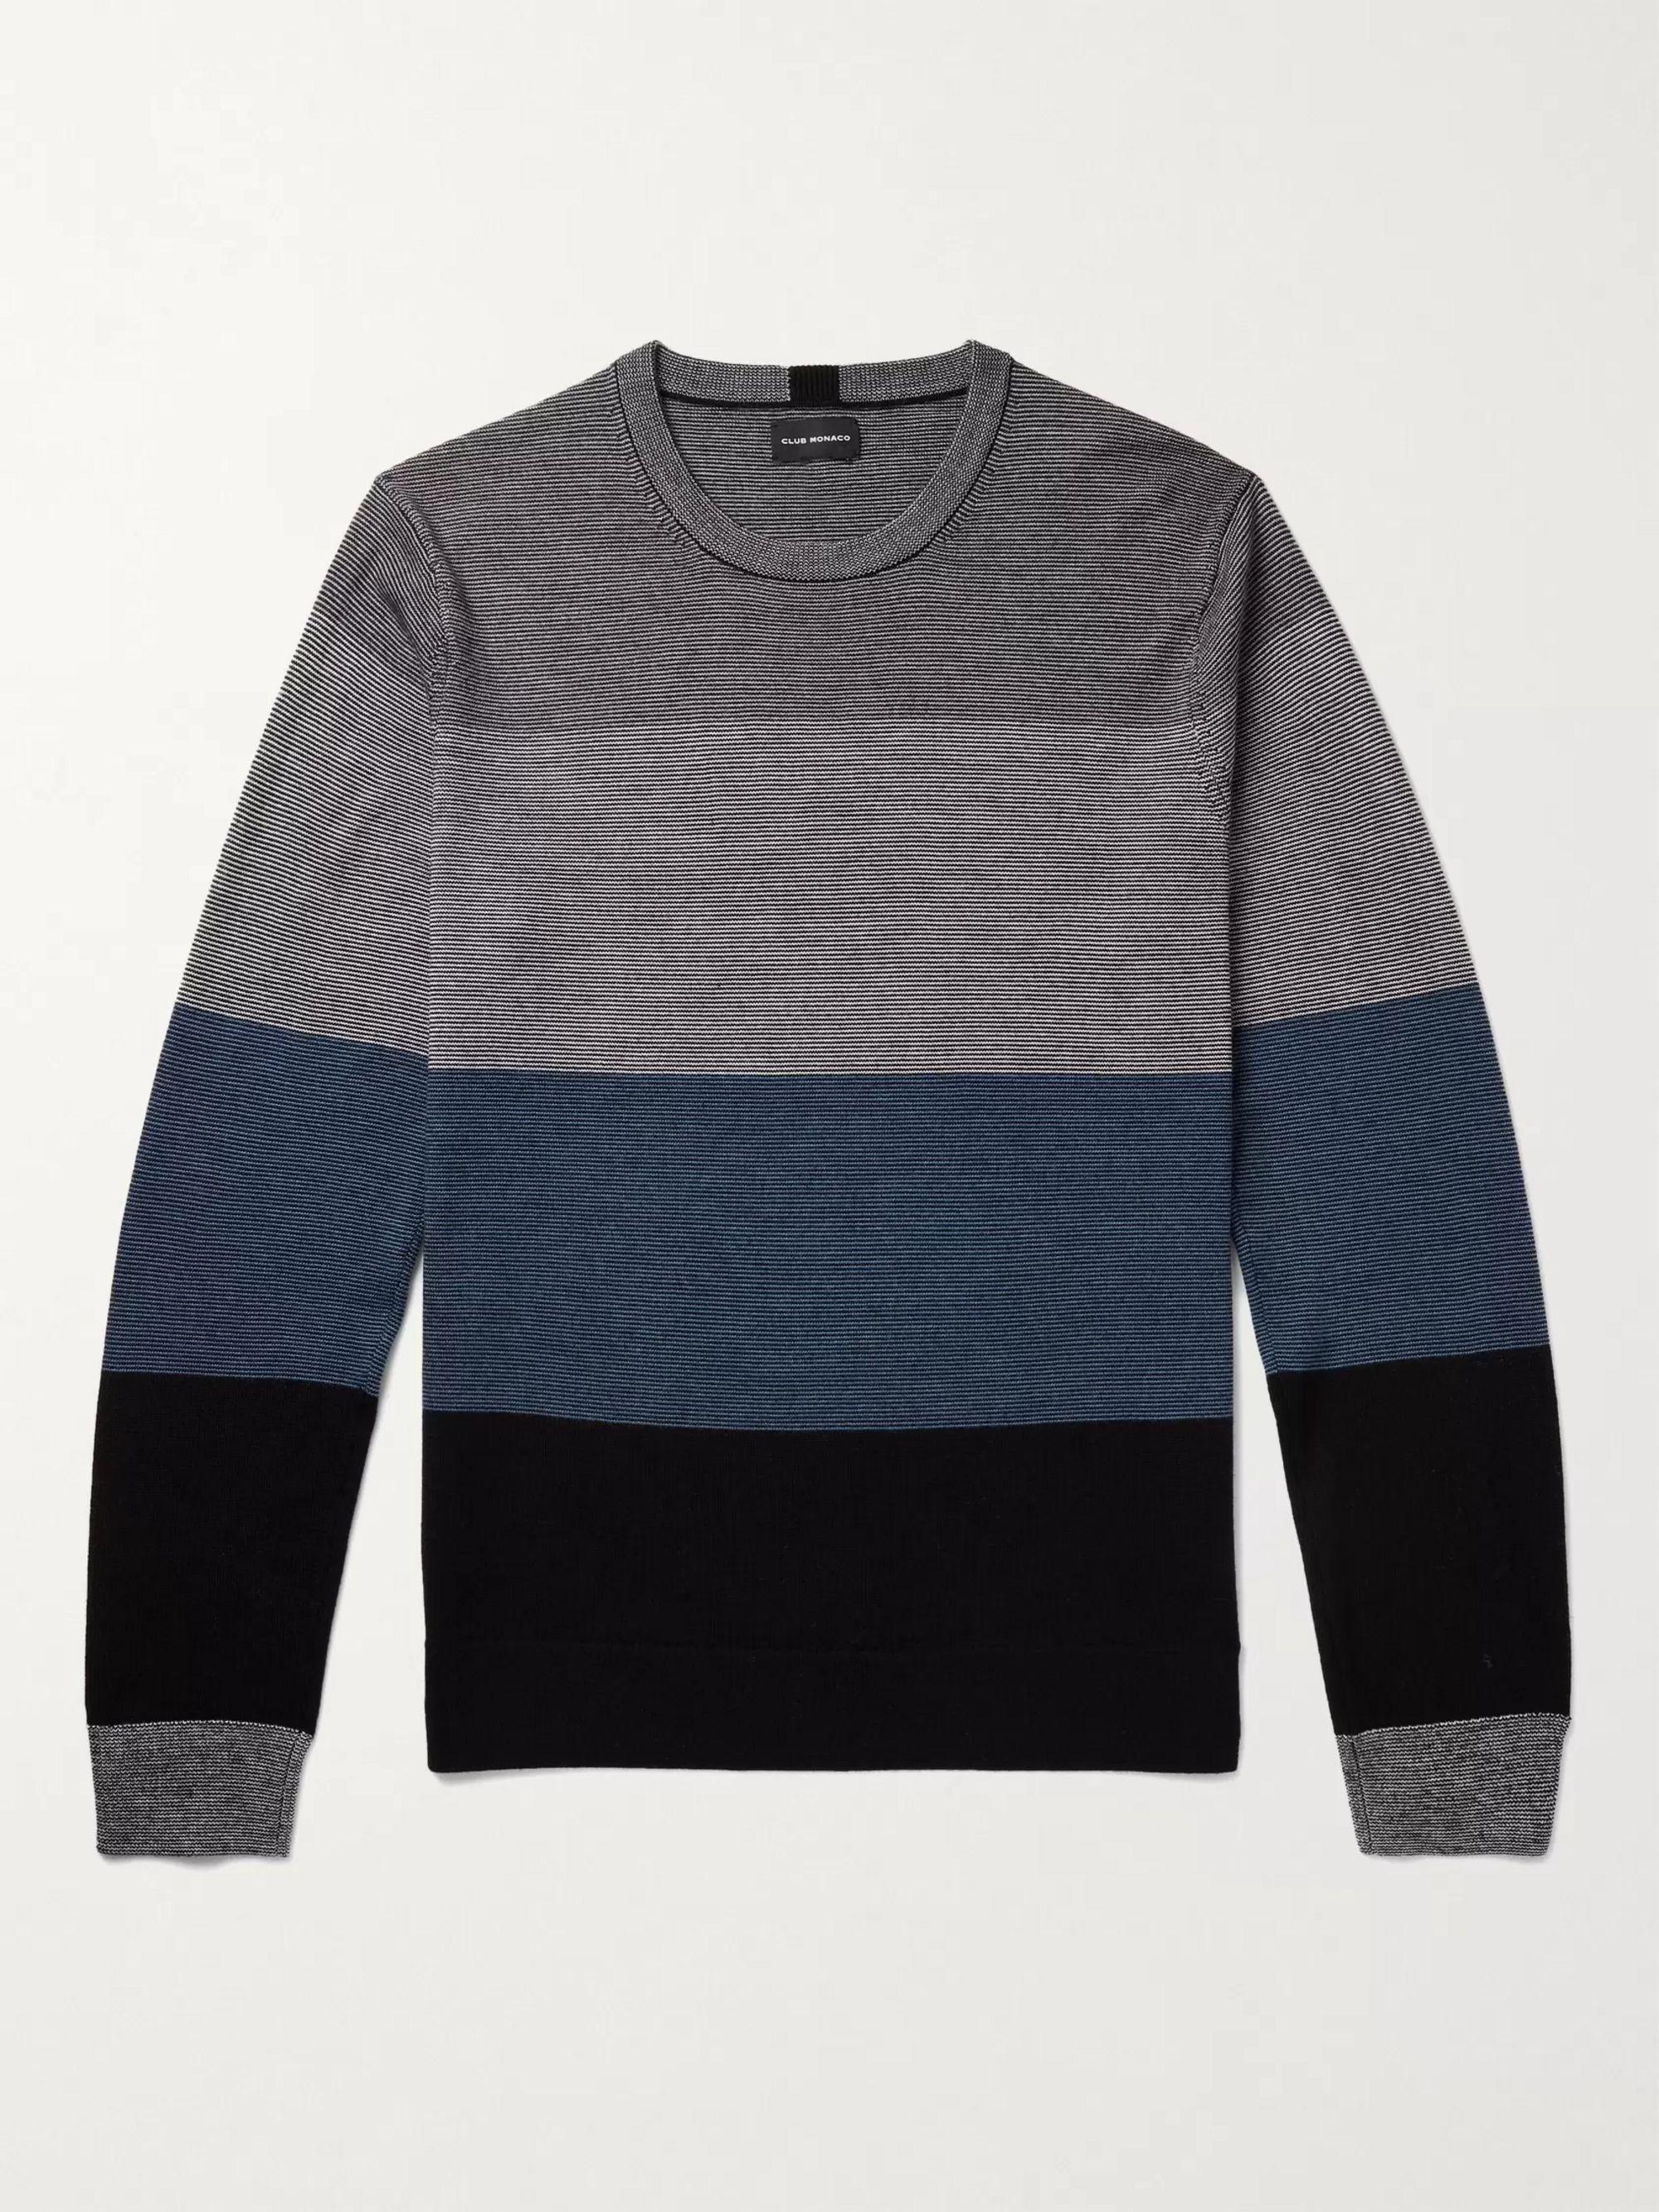 CLUB MONACO Striped Wool Sweater